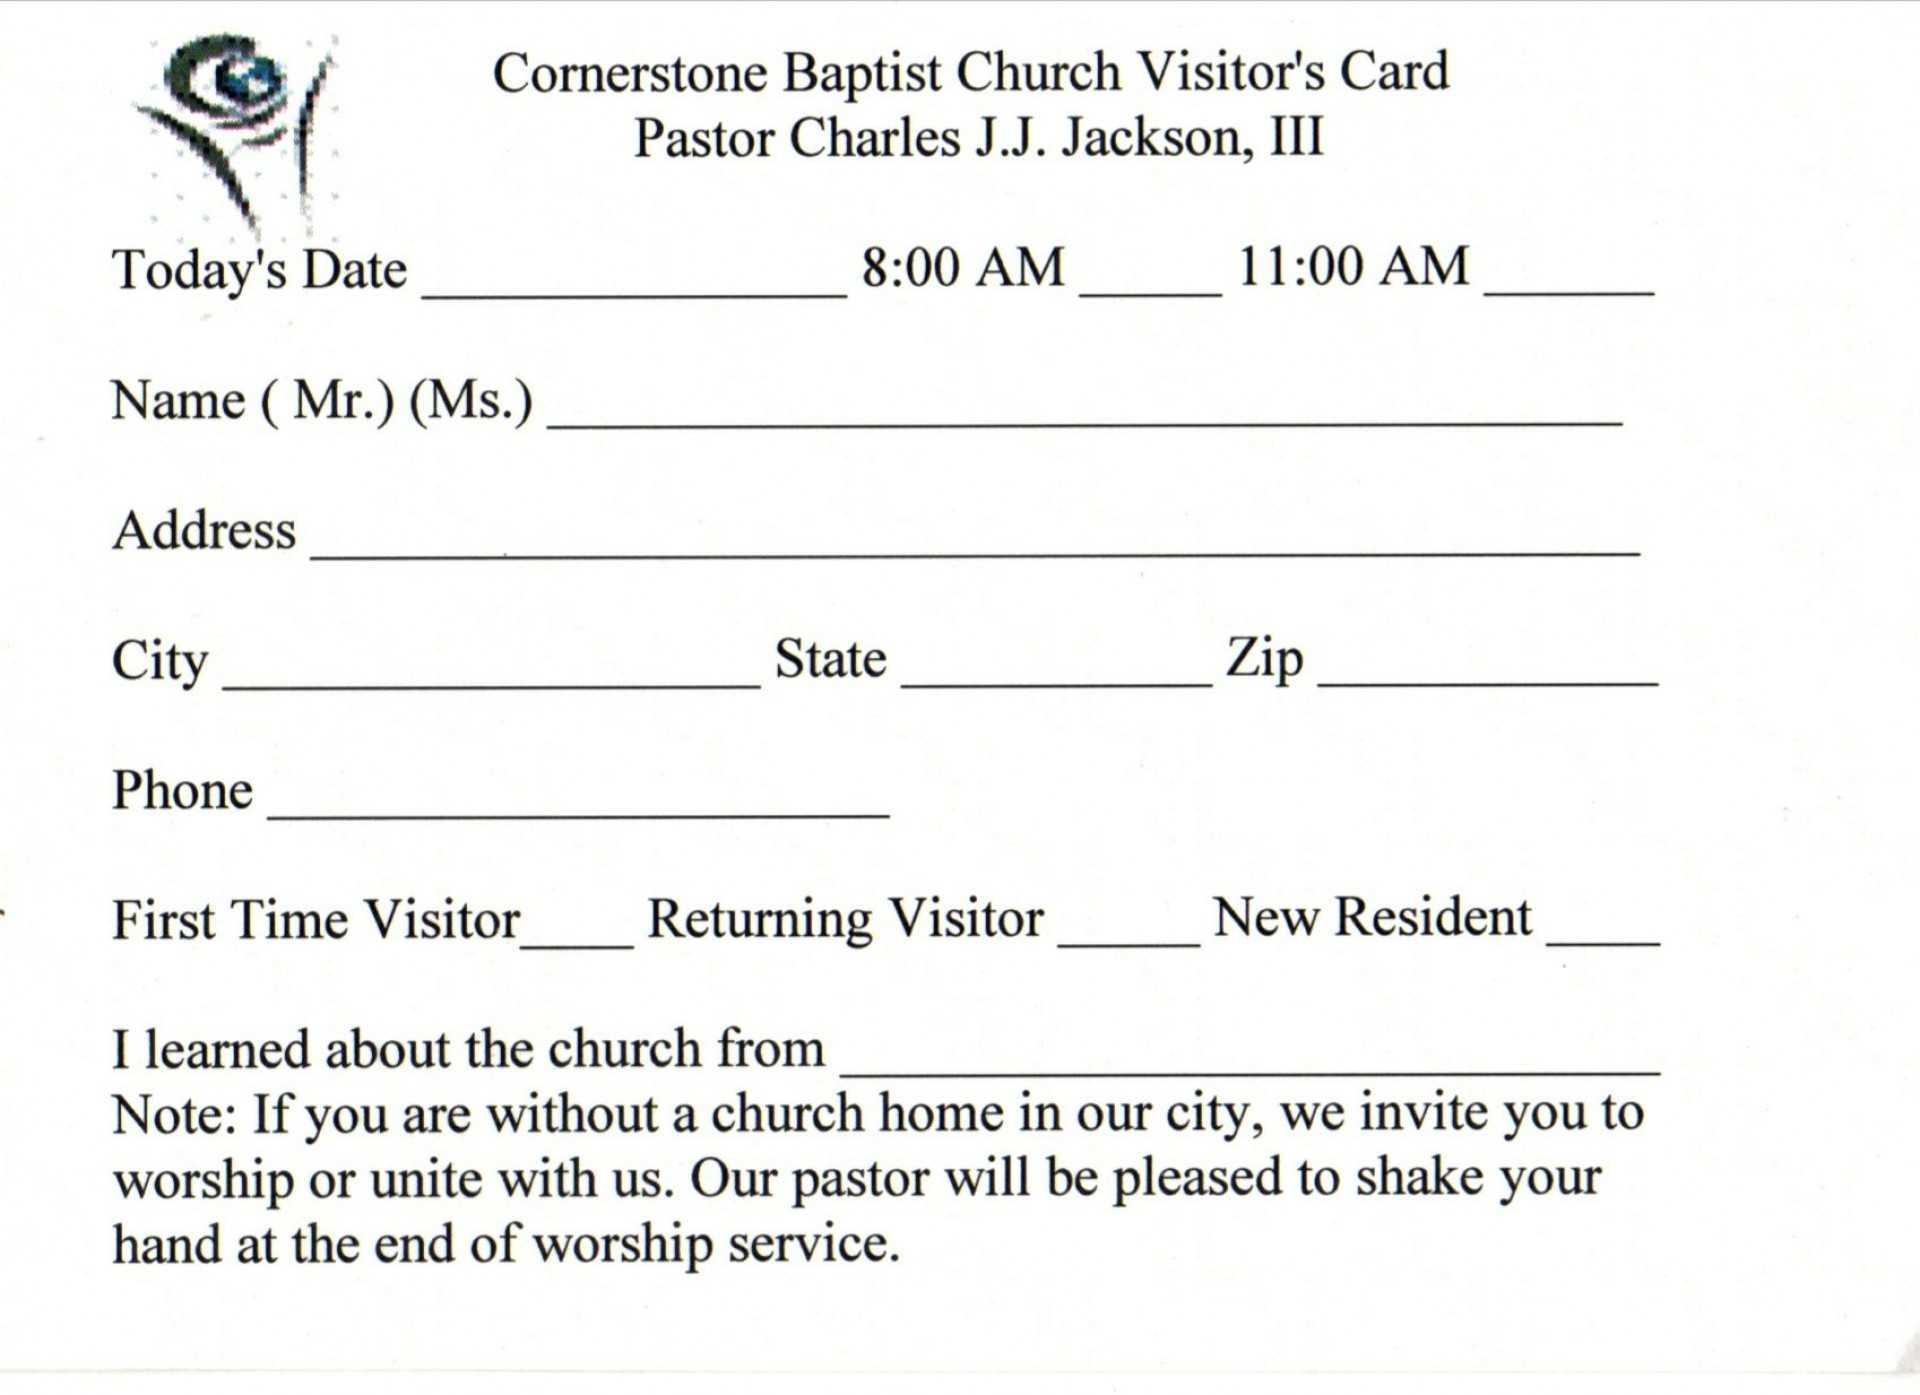 019 Template Ideas Church Visitor Card Word Impressive Pertaining To Church Visitor Card Template Word